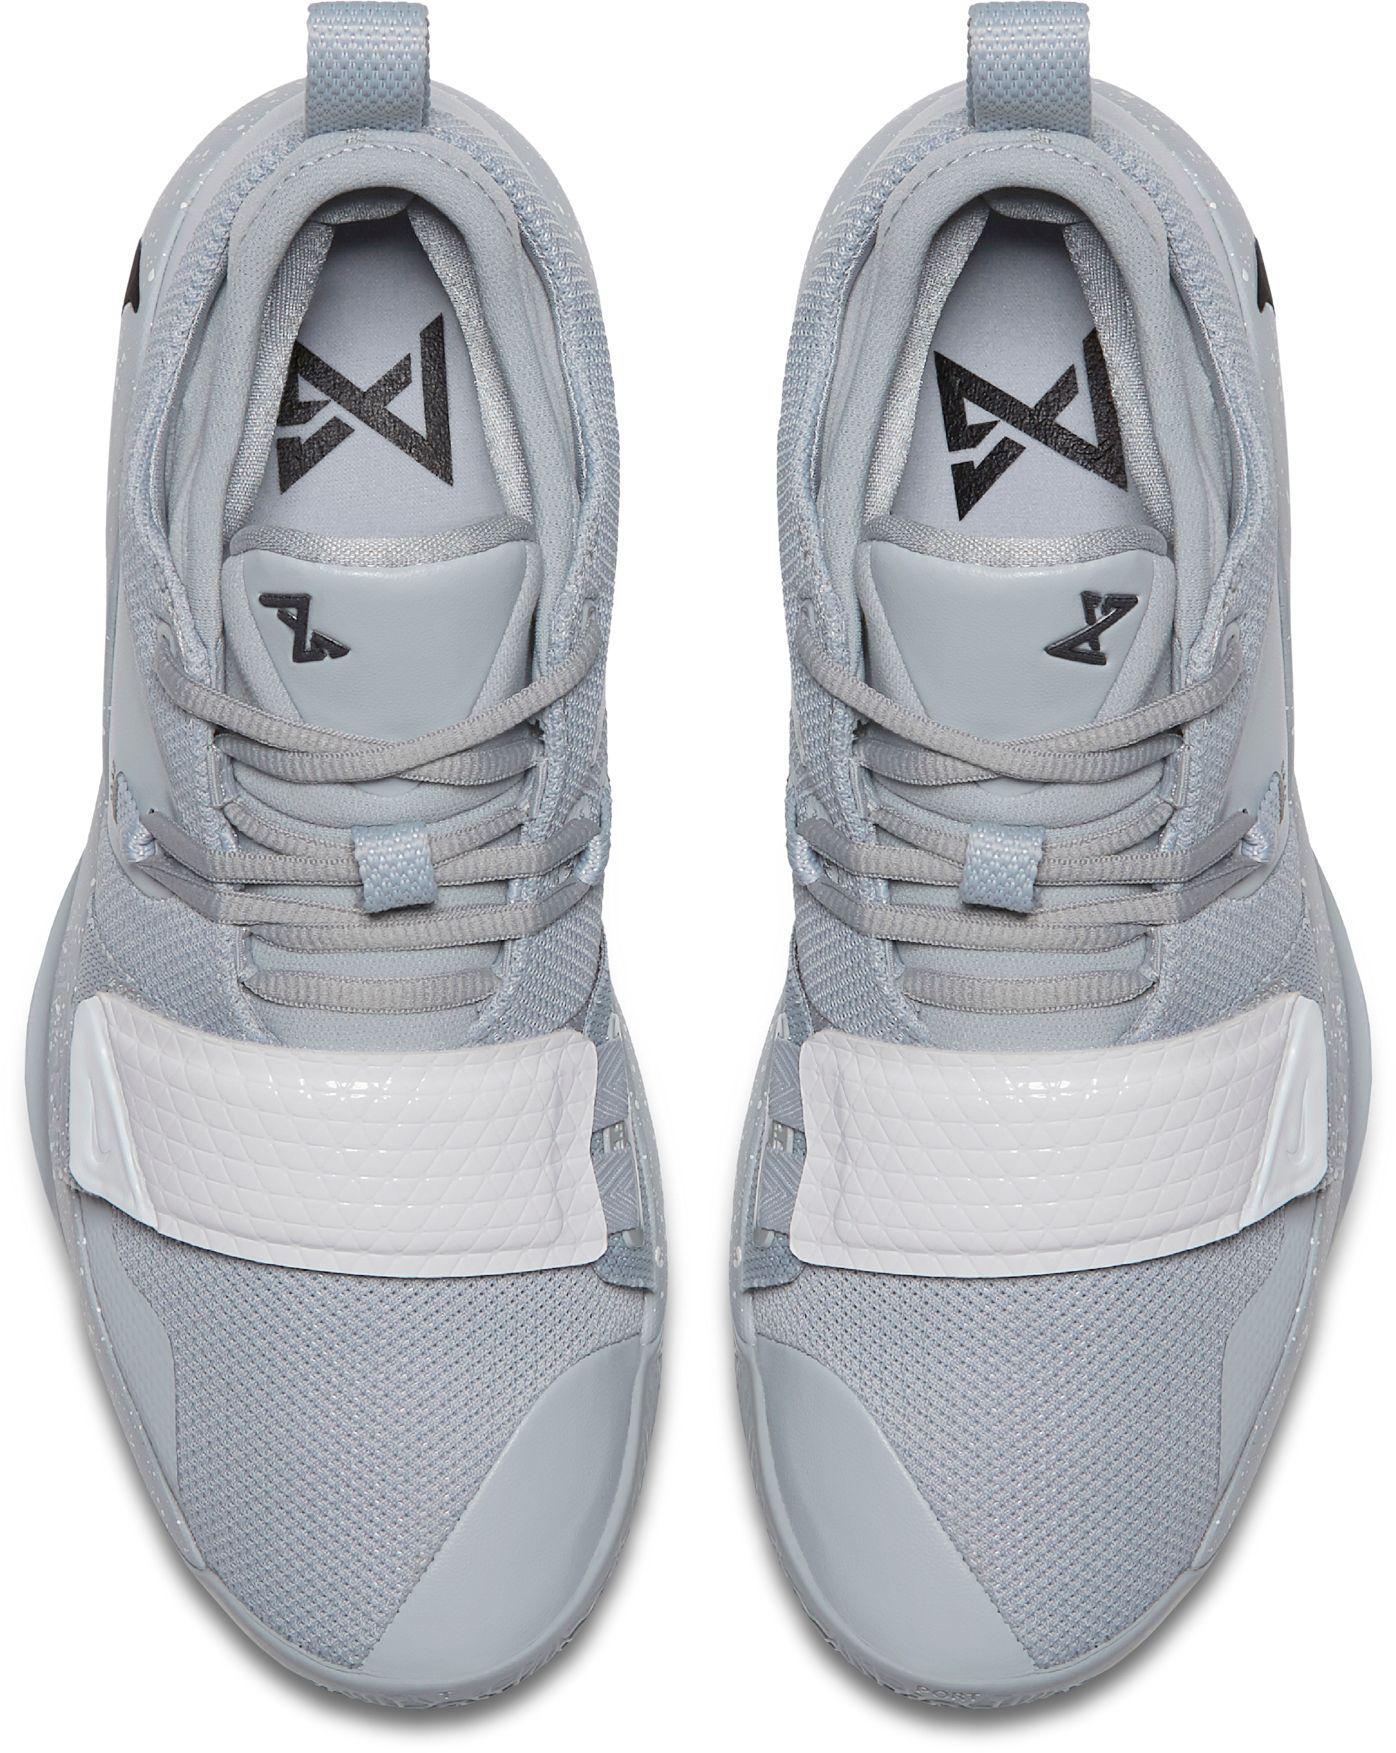 huge selection of 778c0 b8cbe Men's Gray Pg 2.5 Basketball Shoes